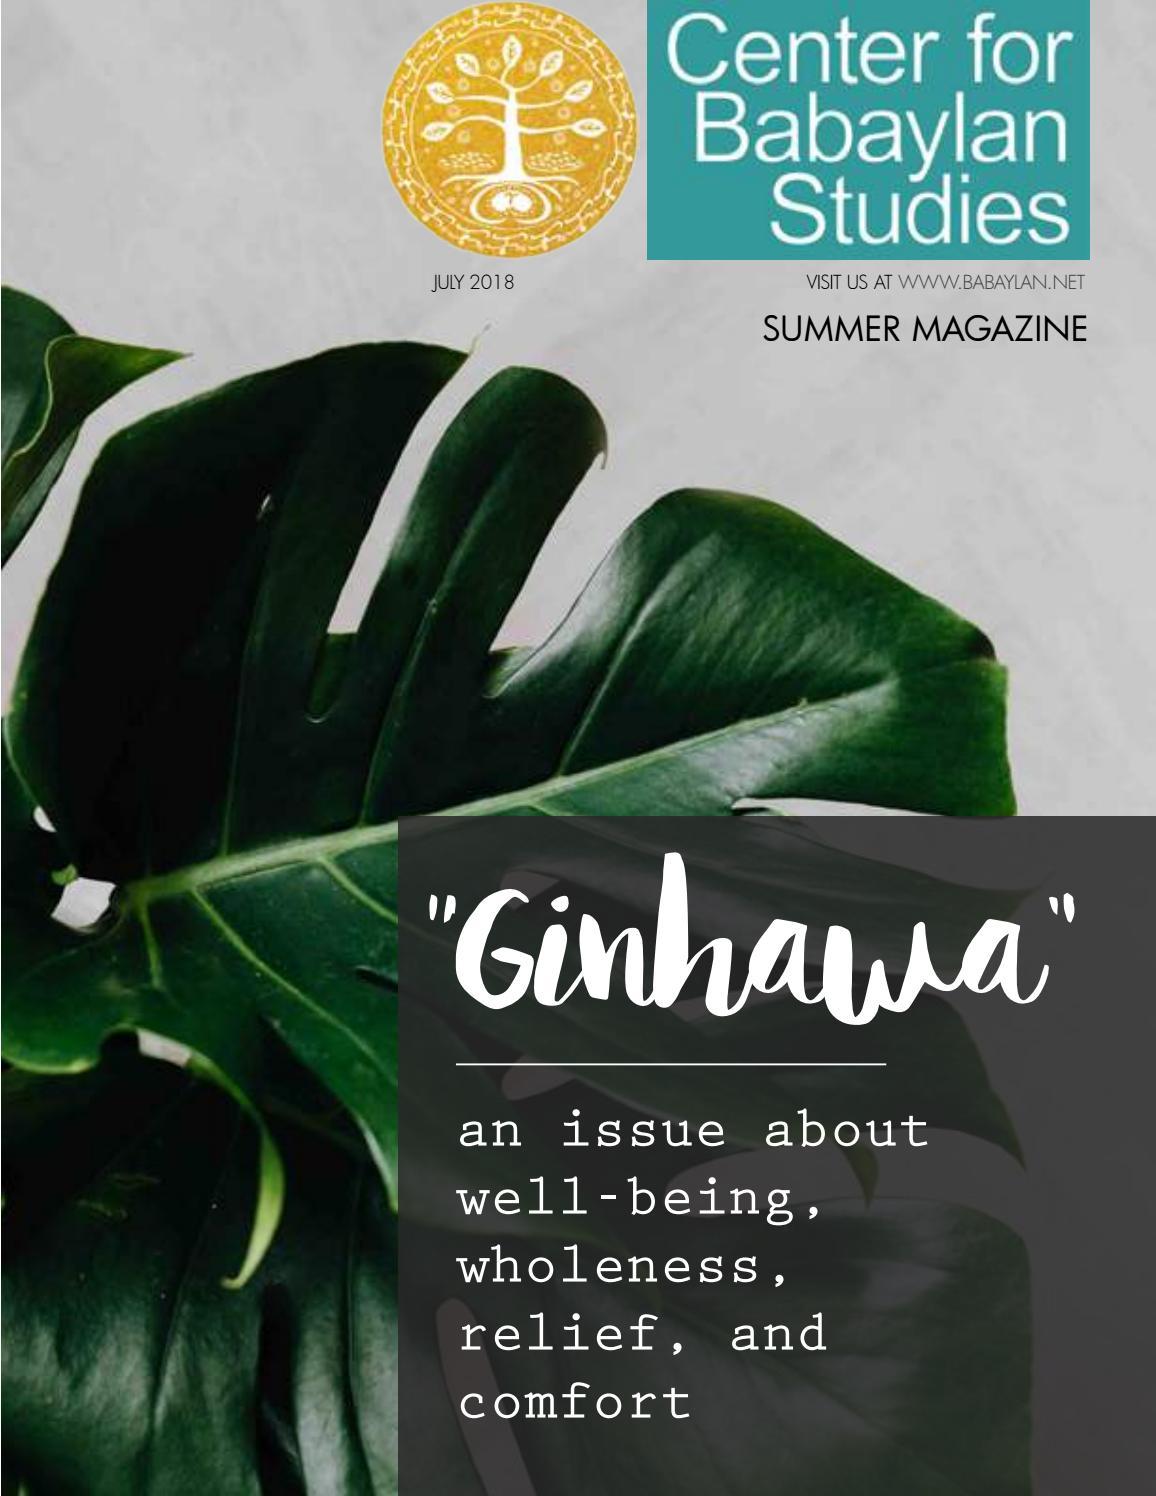 Center for Babaylan Studies   Summer 2018 Magazine by